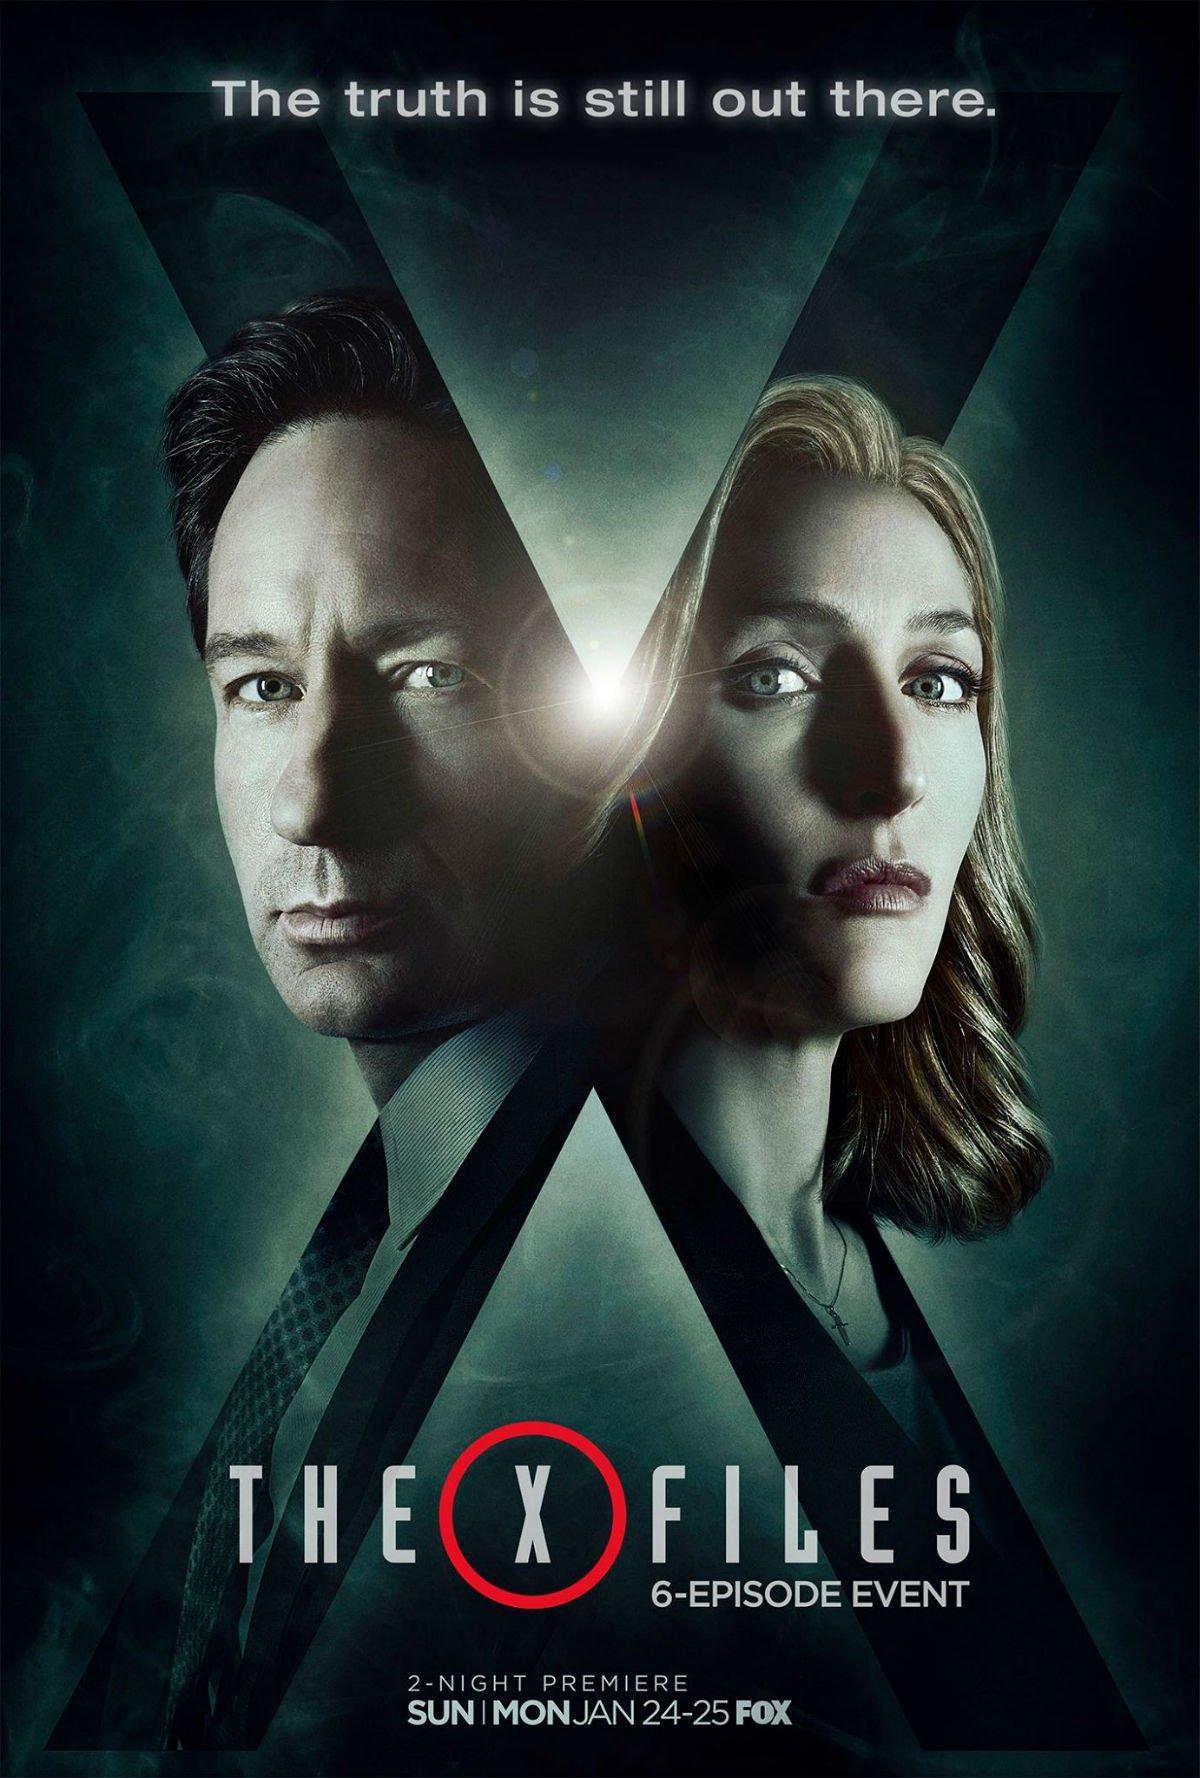 [影集] The X-Files (MiniSeries) (2016) A95bcce385b3de1e573a3d4f61bc947a